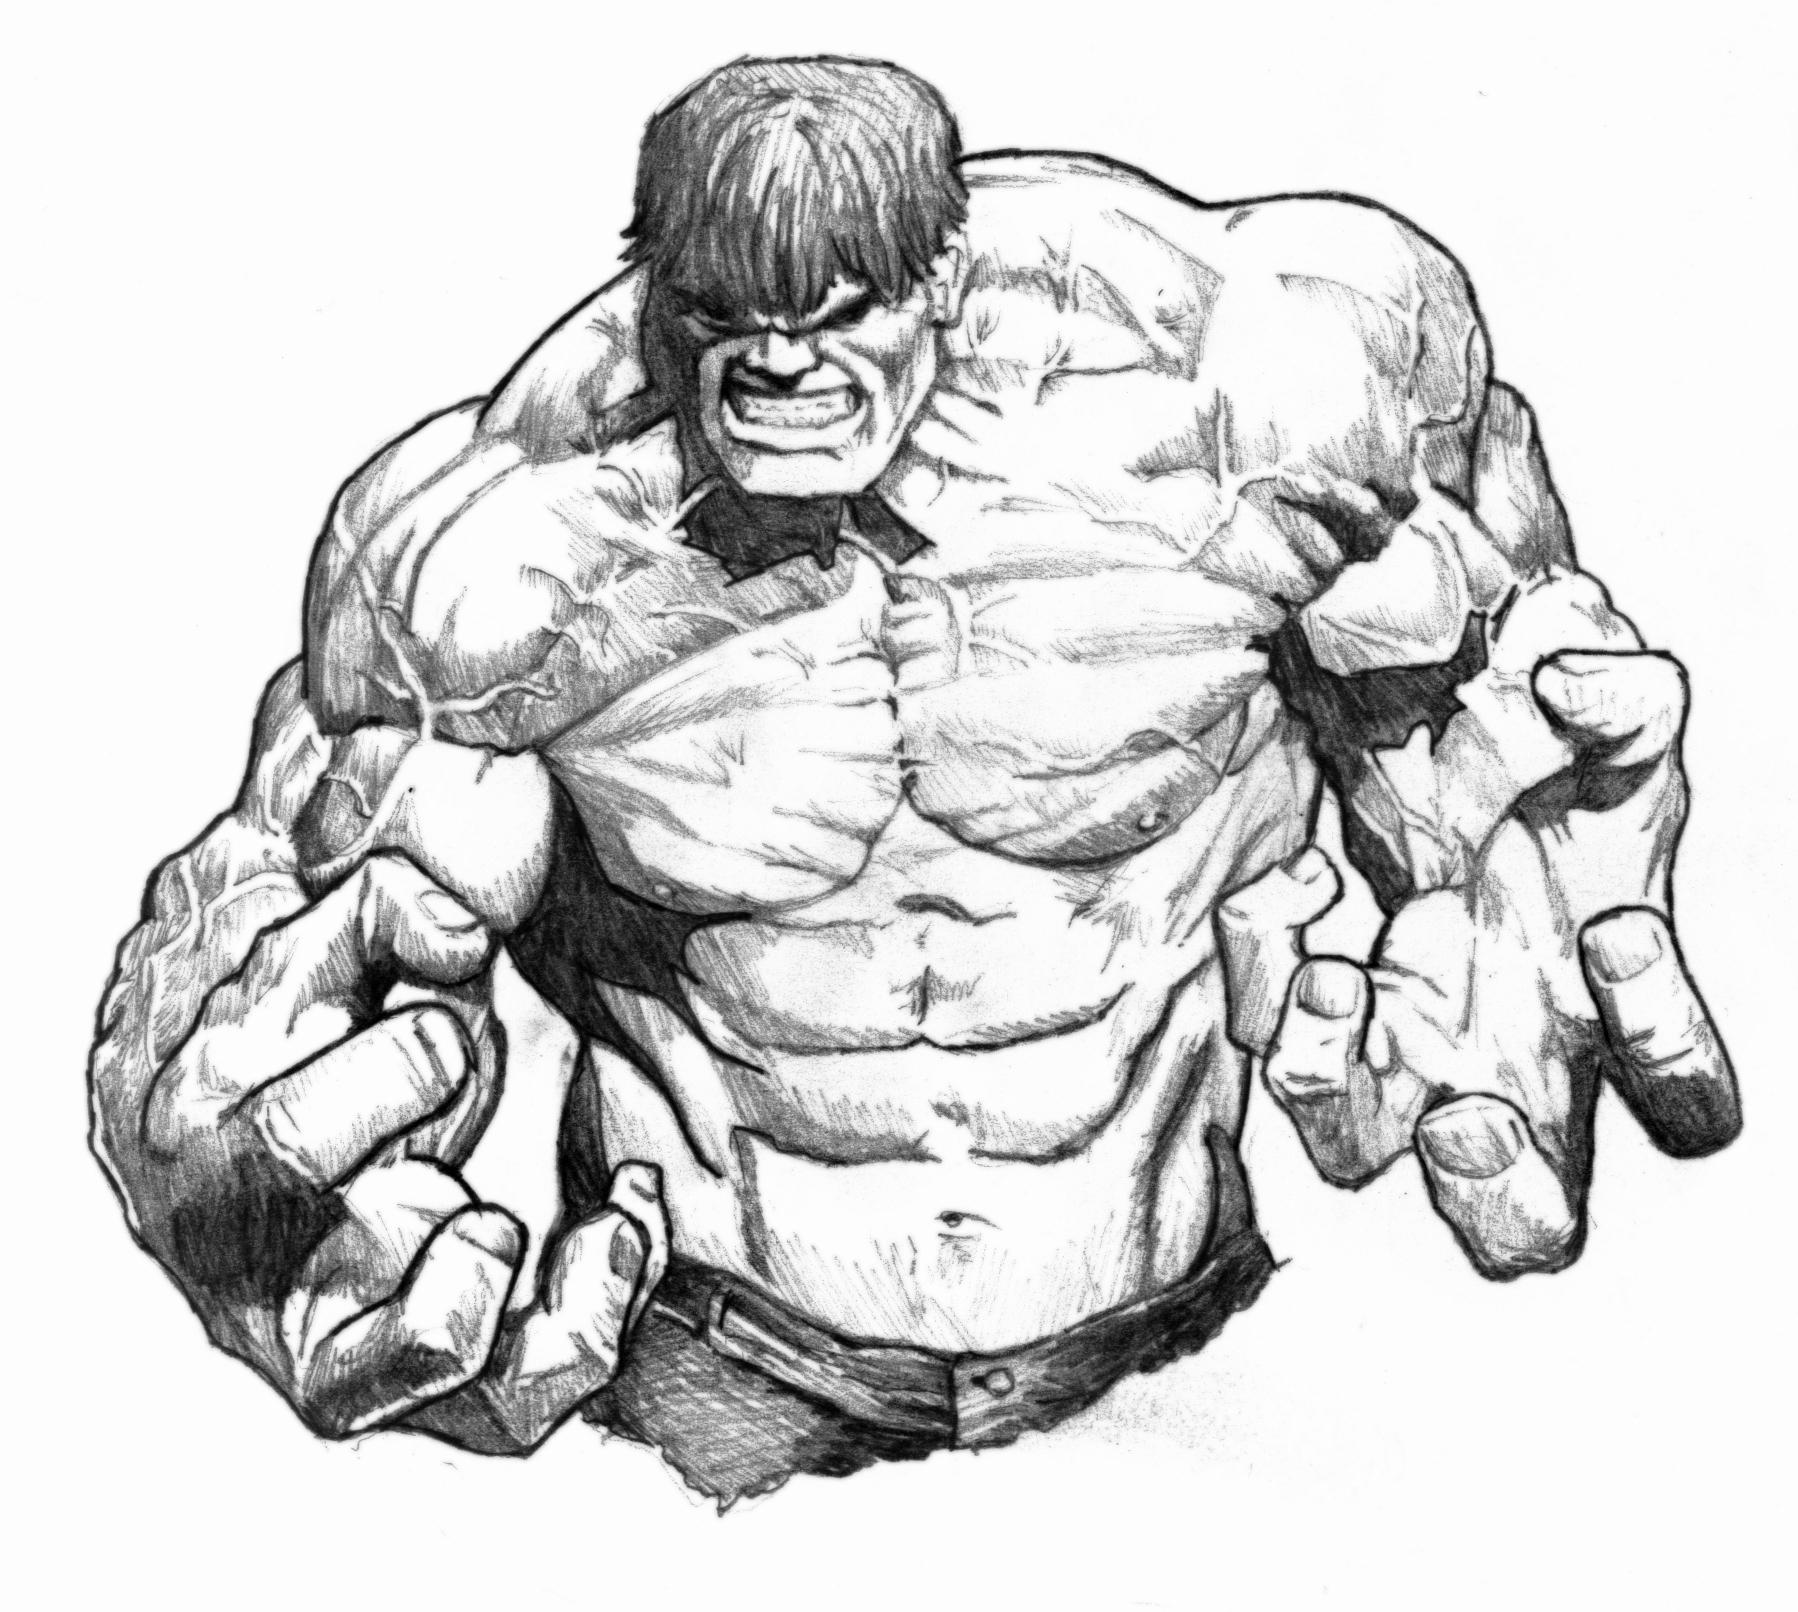 Drawn amd hulk Hulk Incredible hulk  DAP